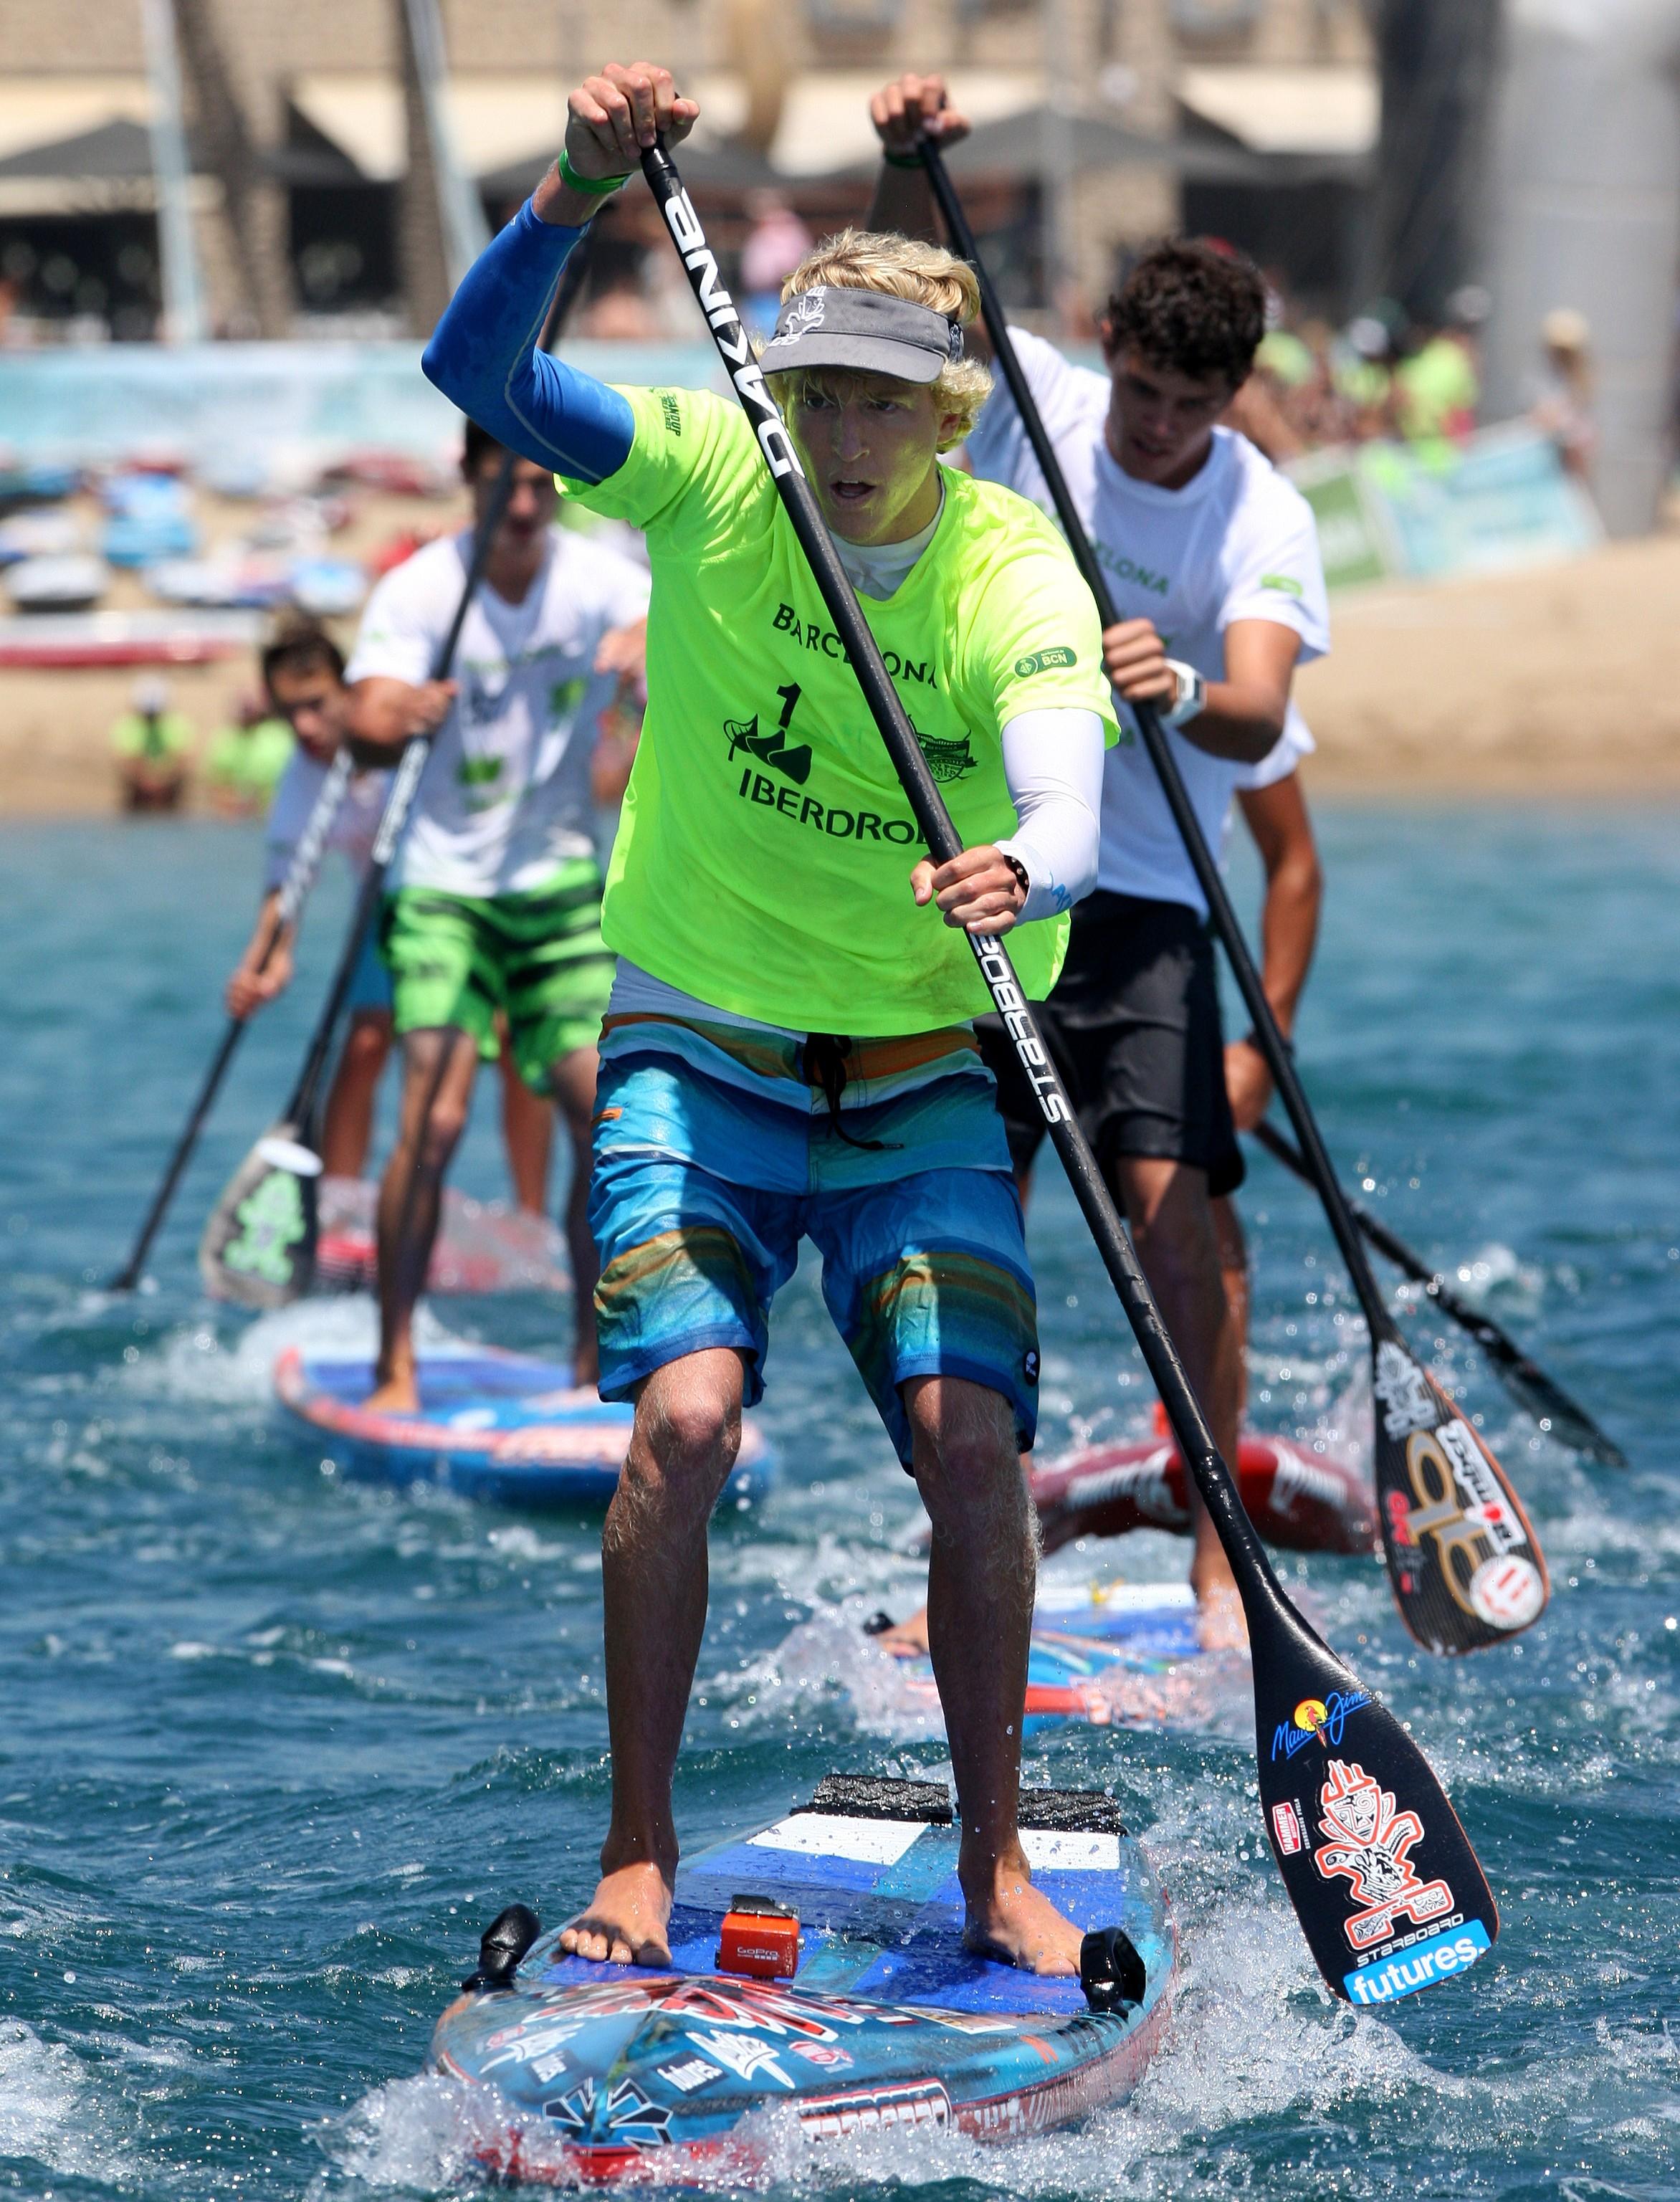 Connor-paddling Barcelona